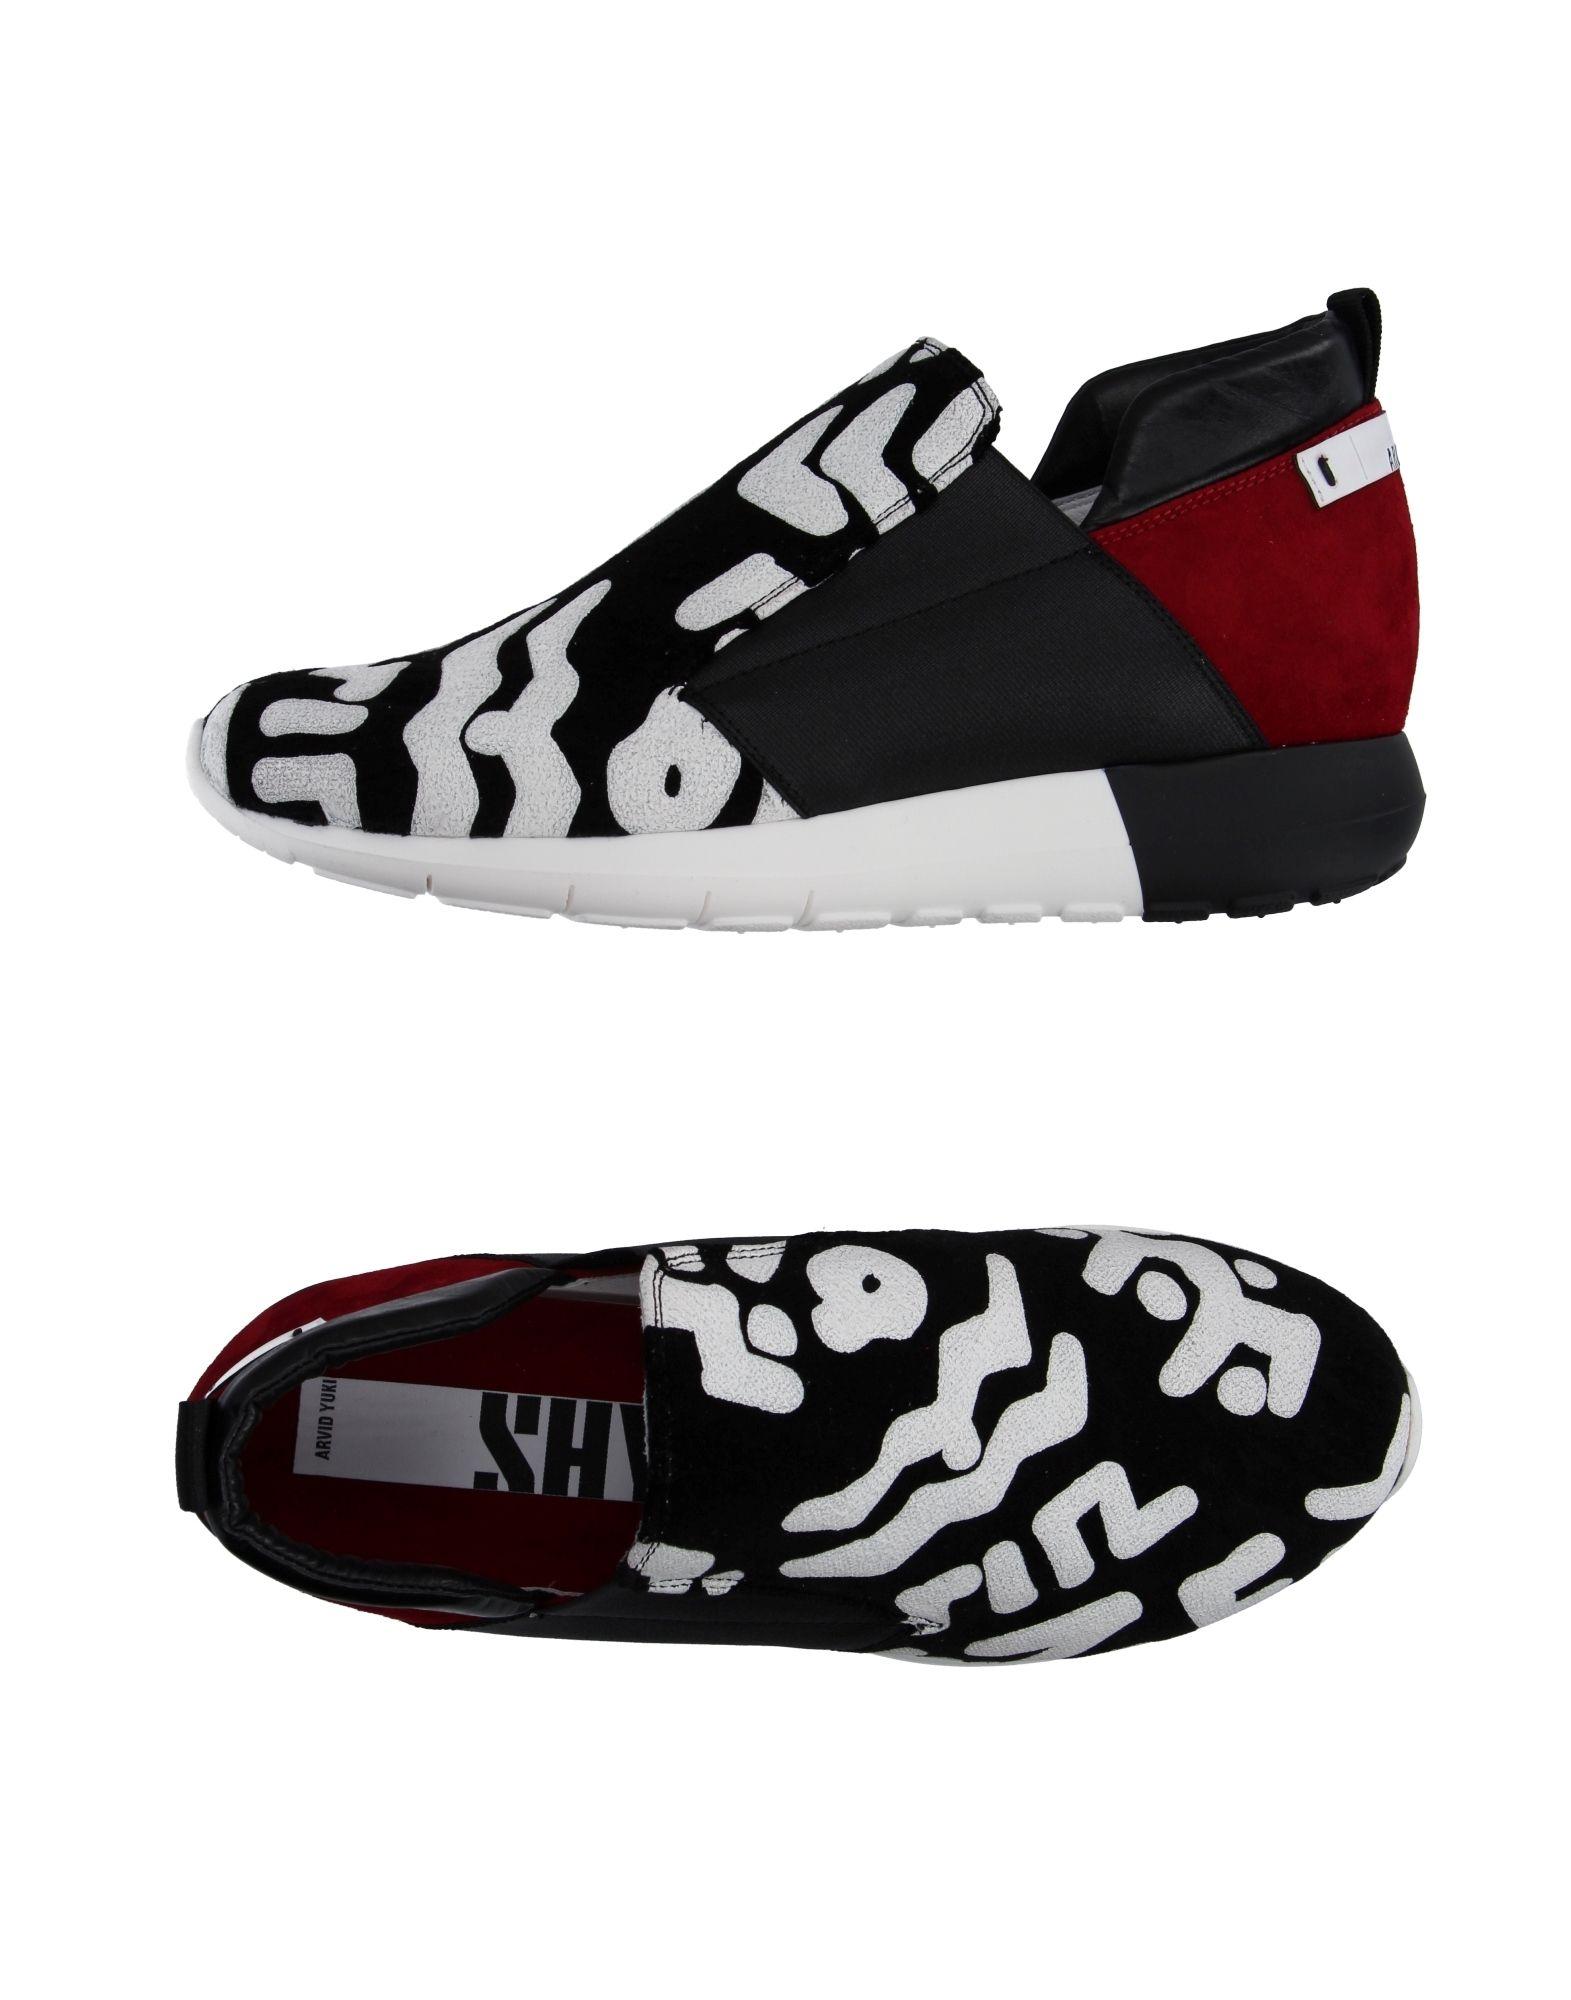 Shy - By Arvid Yuki Sneakers - Shy Women Shy By Arvid Yuki Sneakers online on  Australia - 11048970RU 076f01